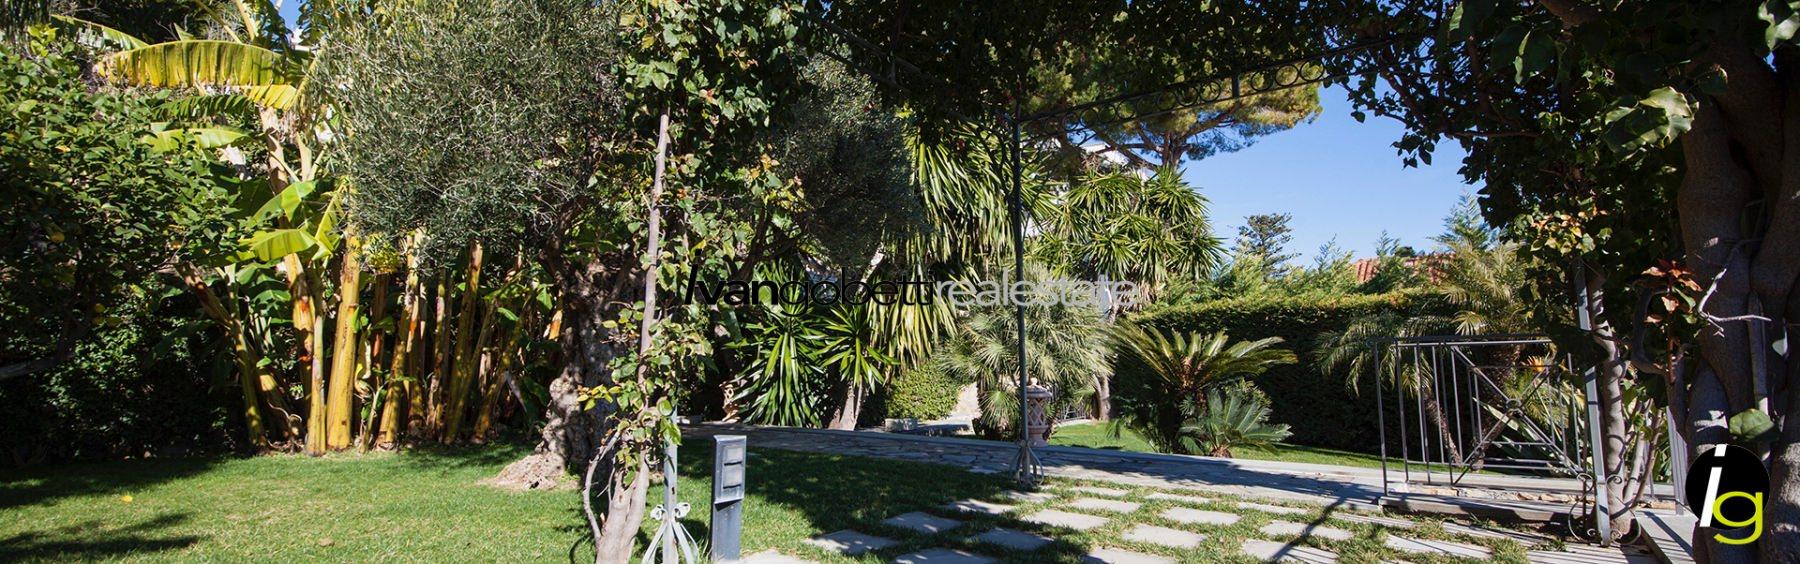 Liguria, Bordighera villa moderna in vendita